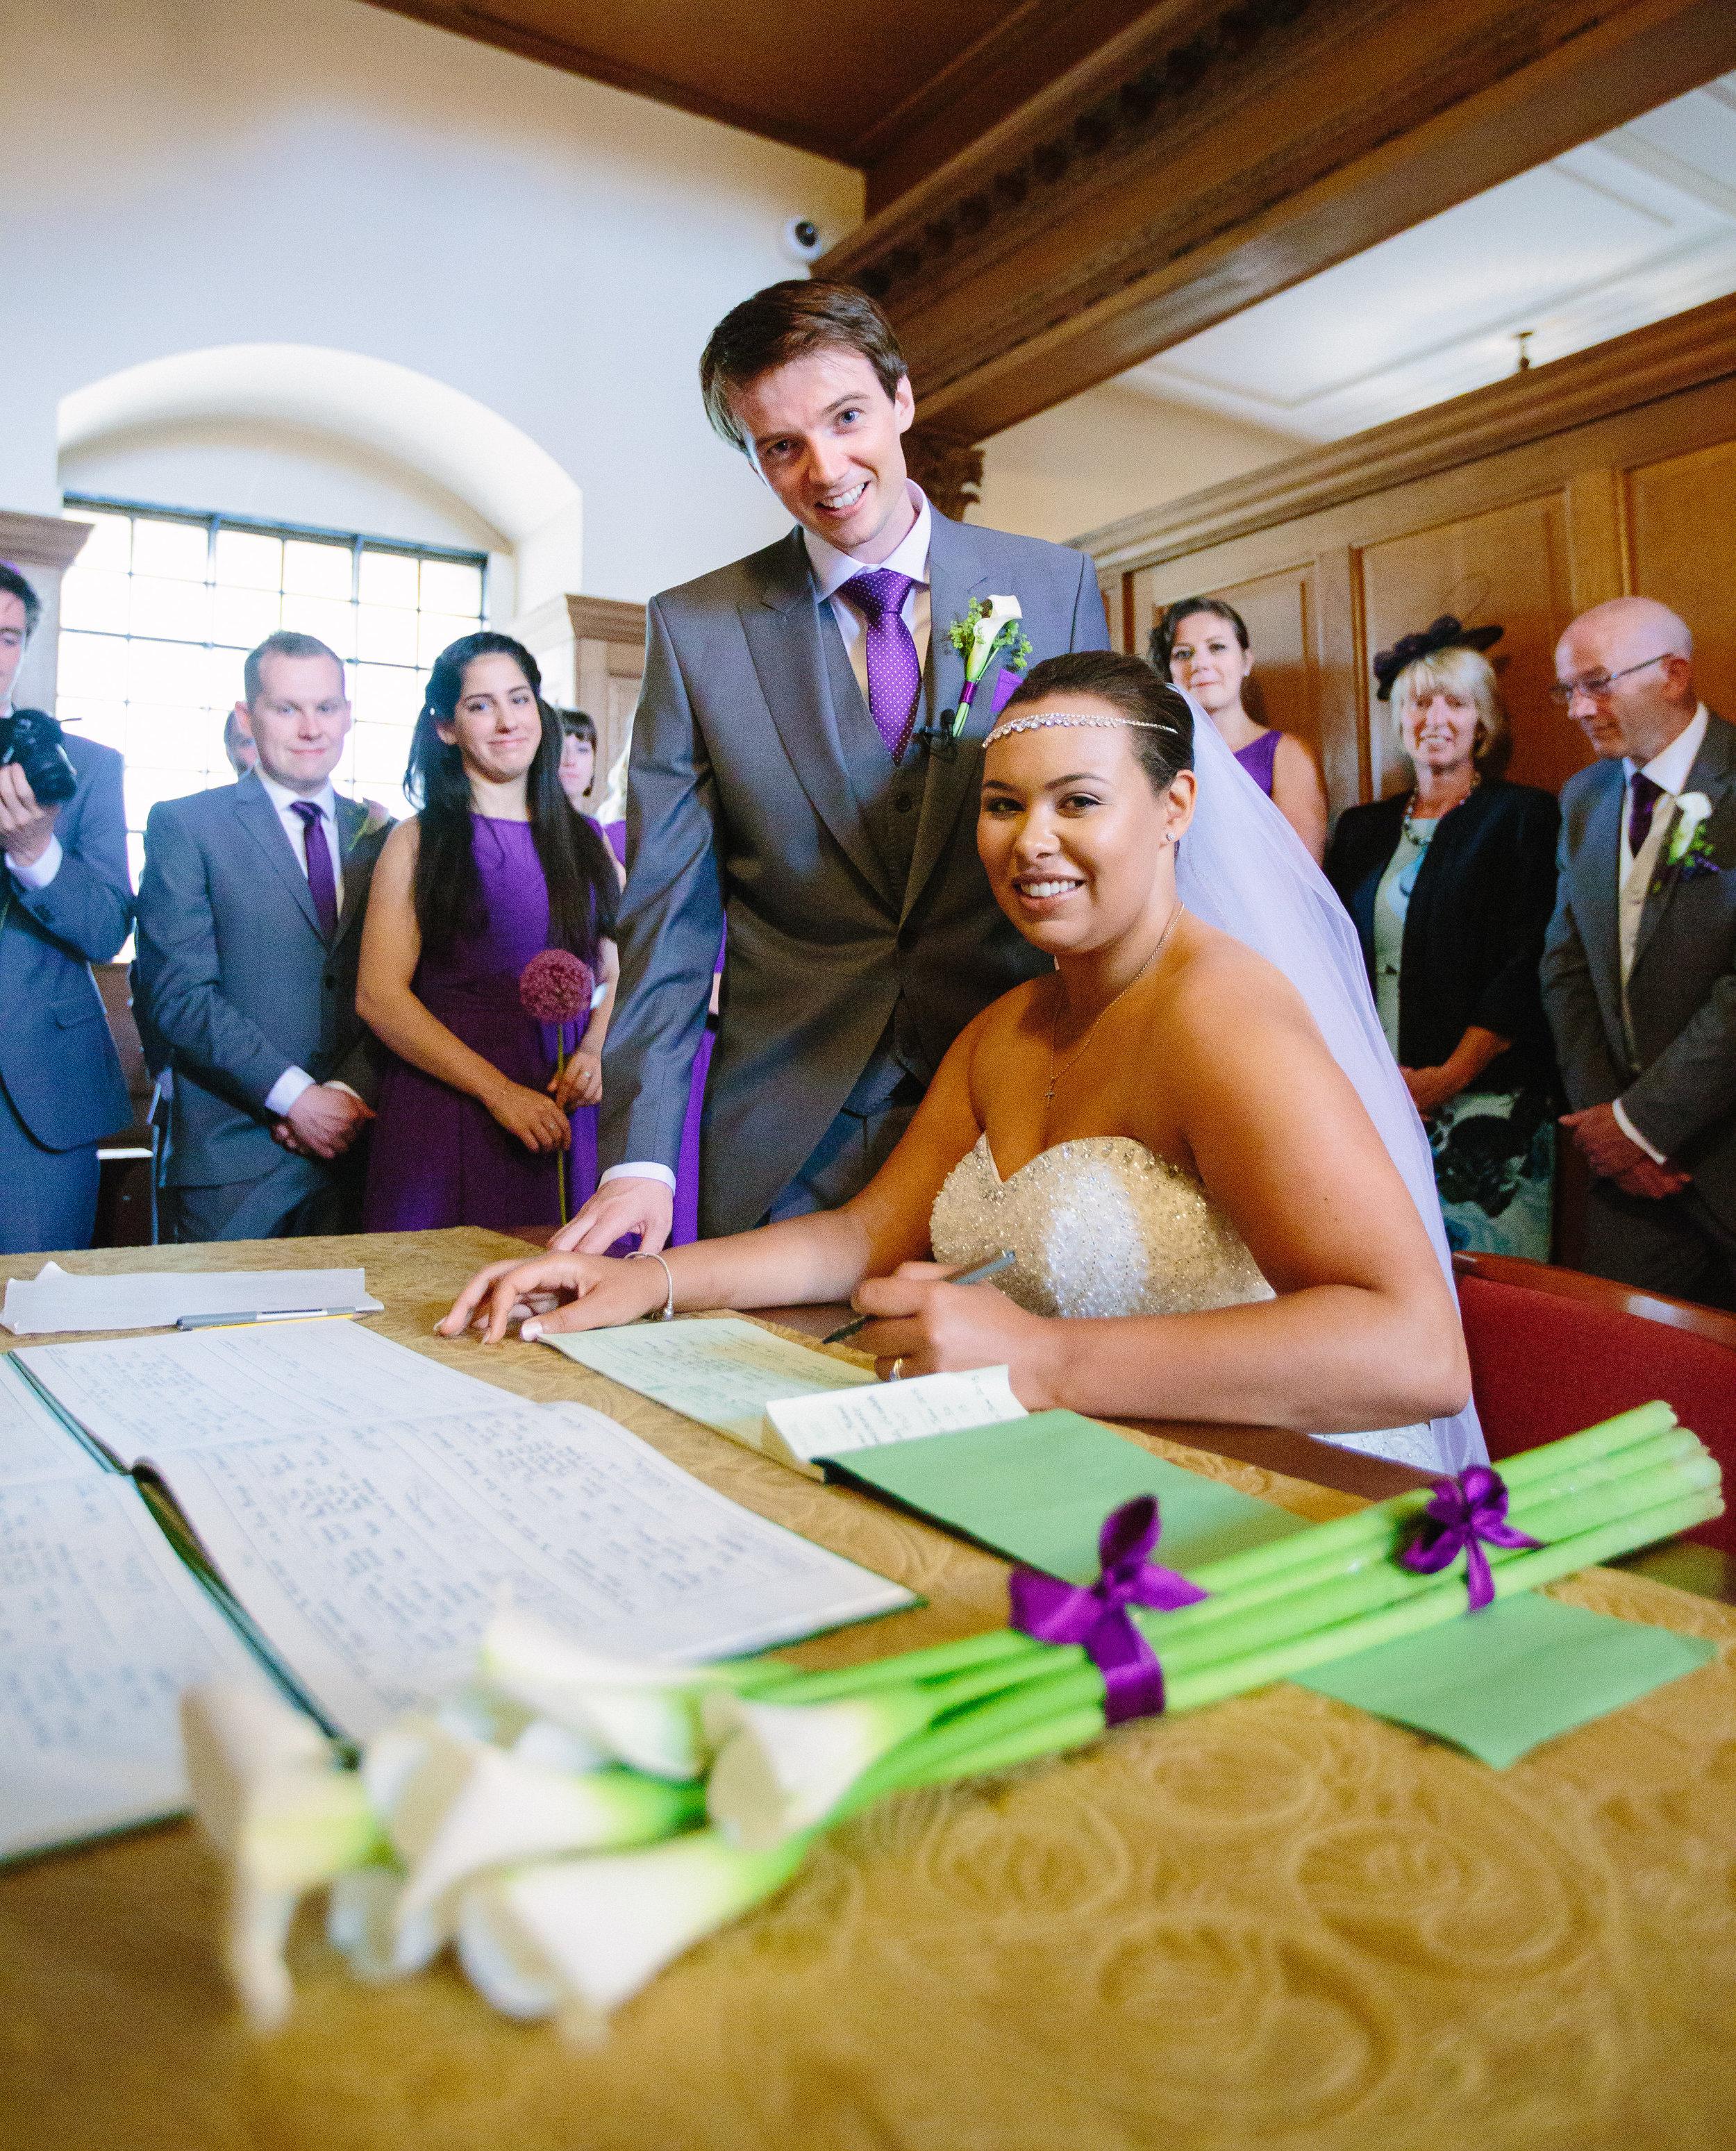 Saint-Alfege-Church-greenwich-wedding-charlton-london-sign-register-145